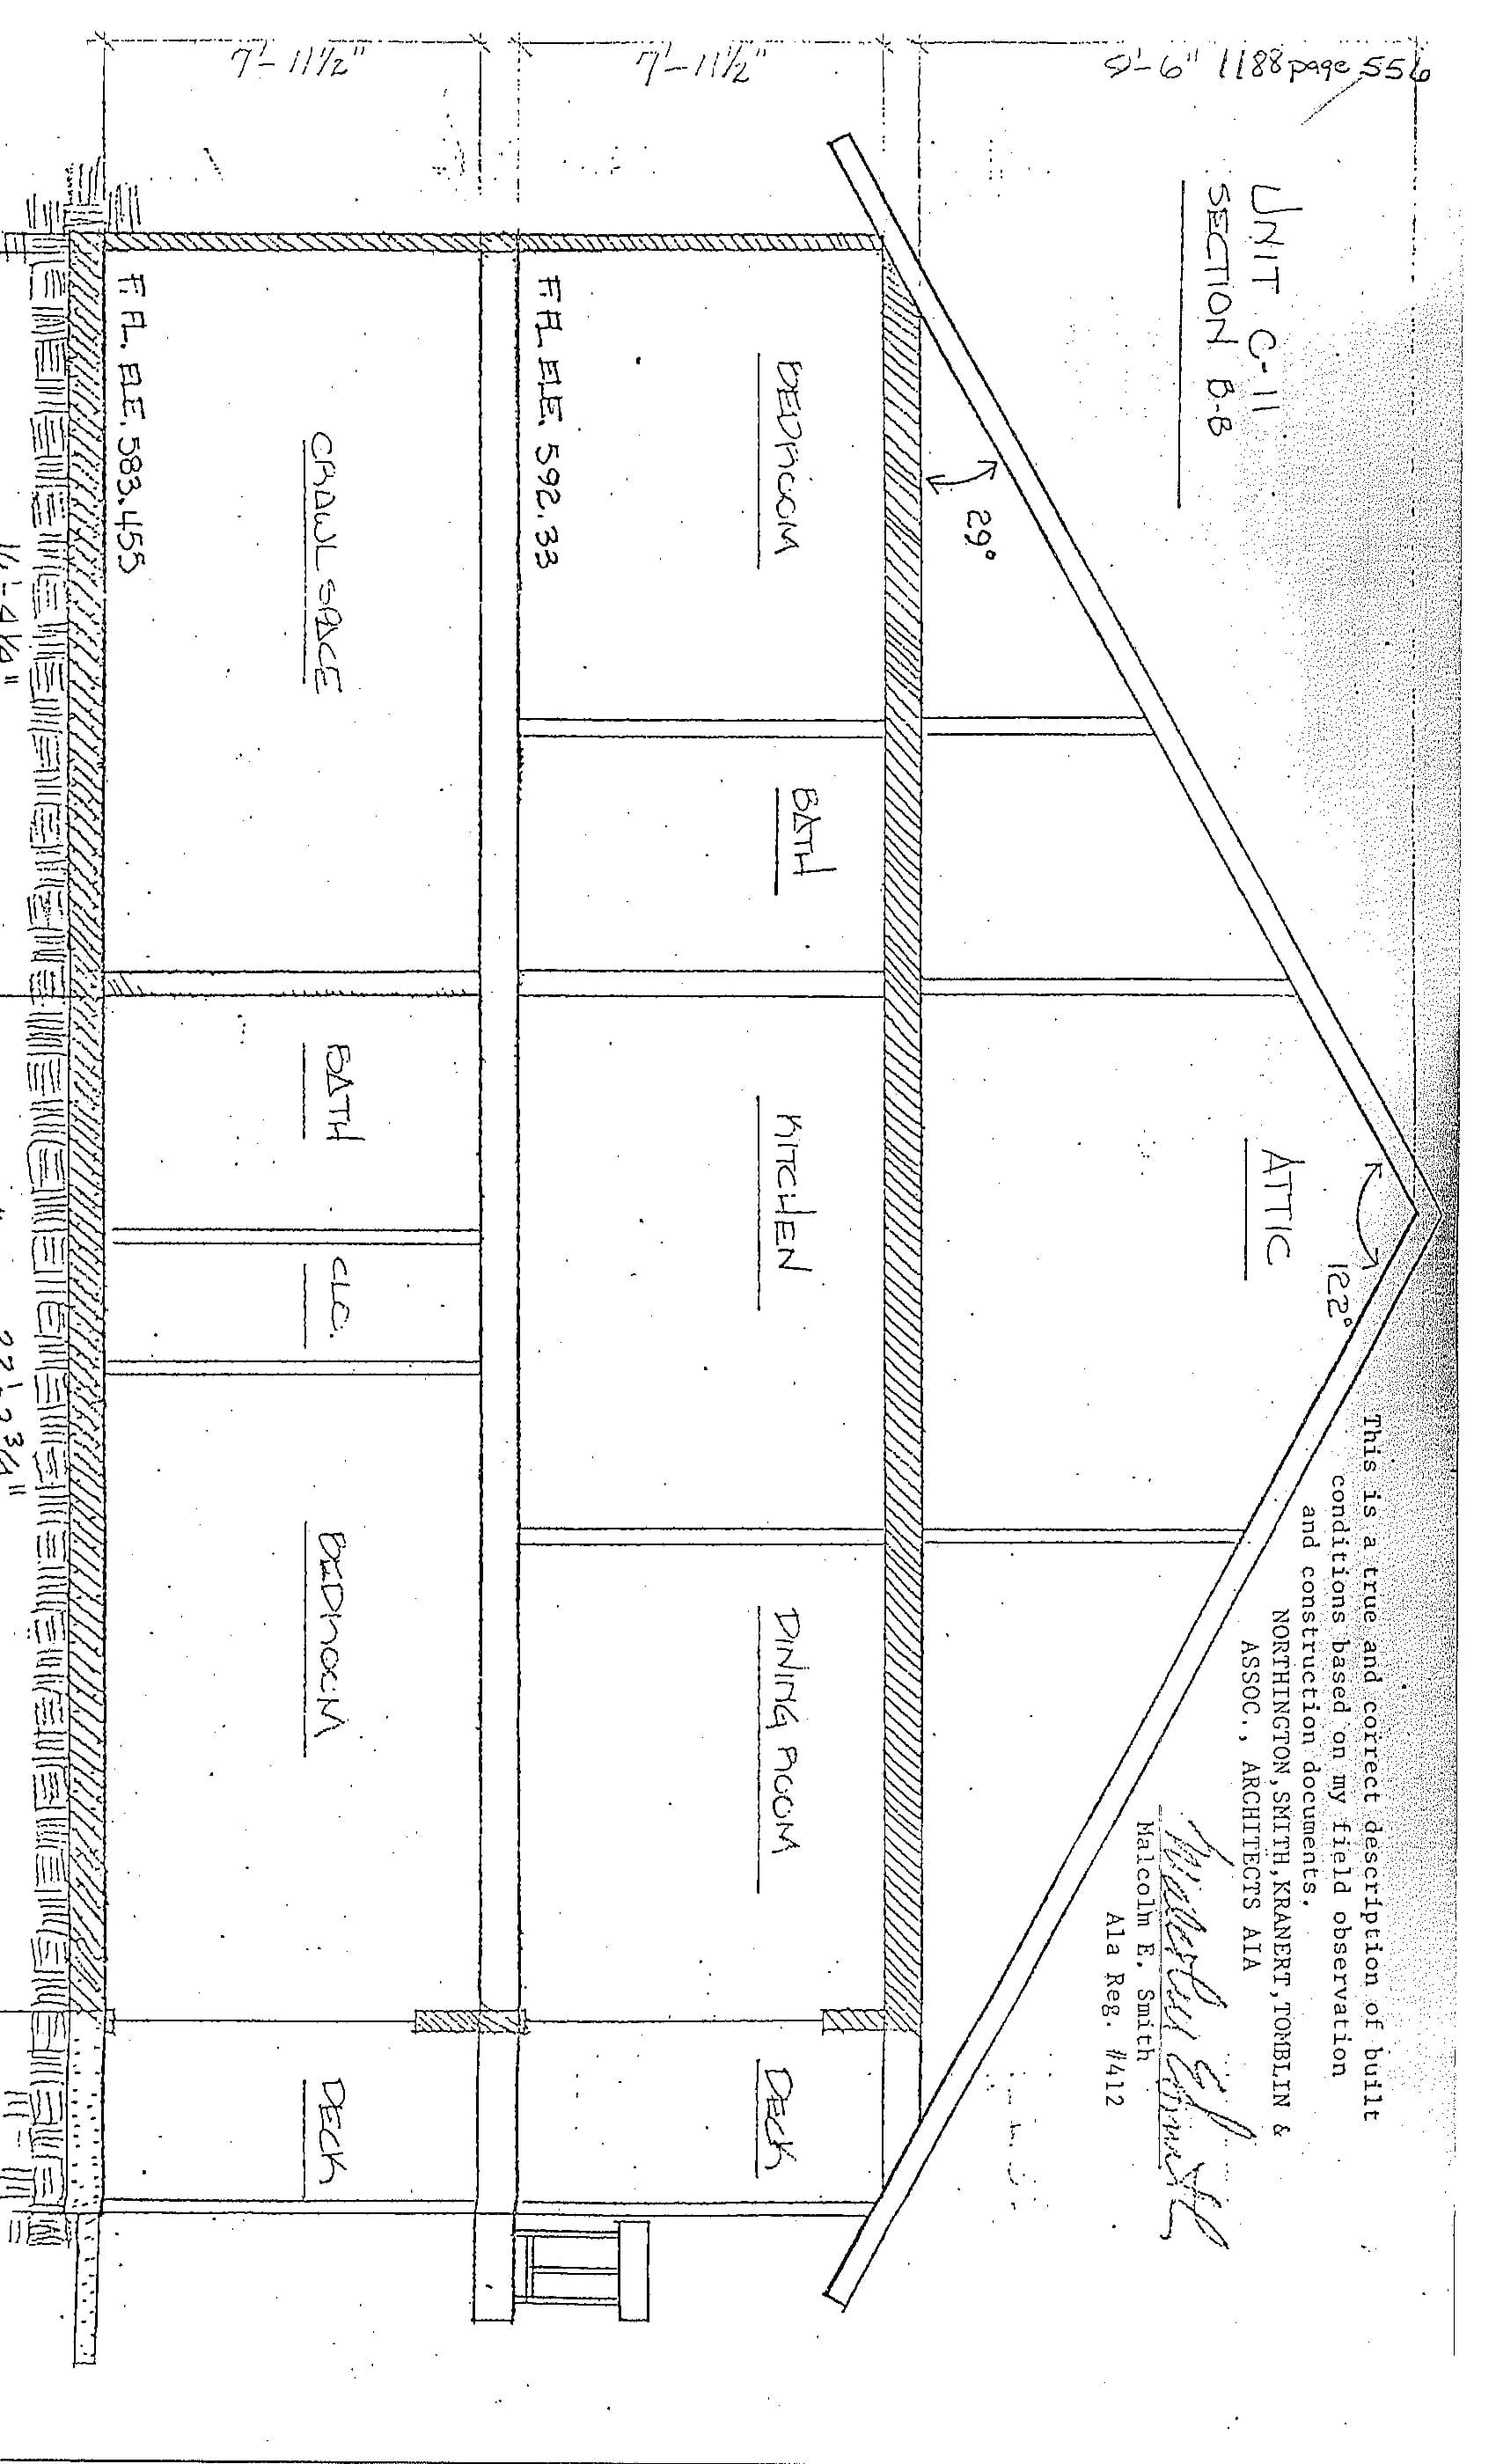 Covenants-Rivers-Edge-Condominiums-All-Phases-065.jpg